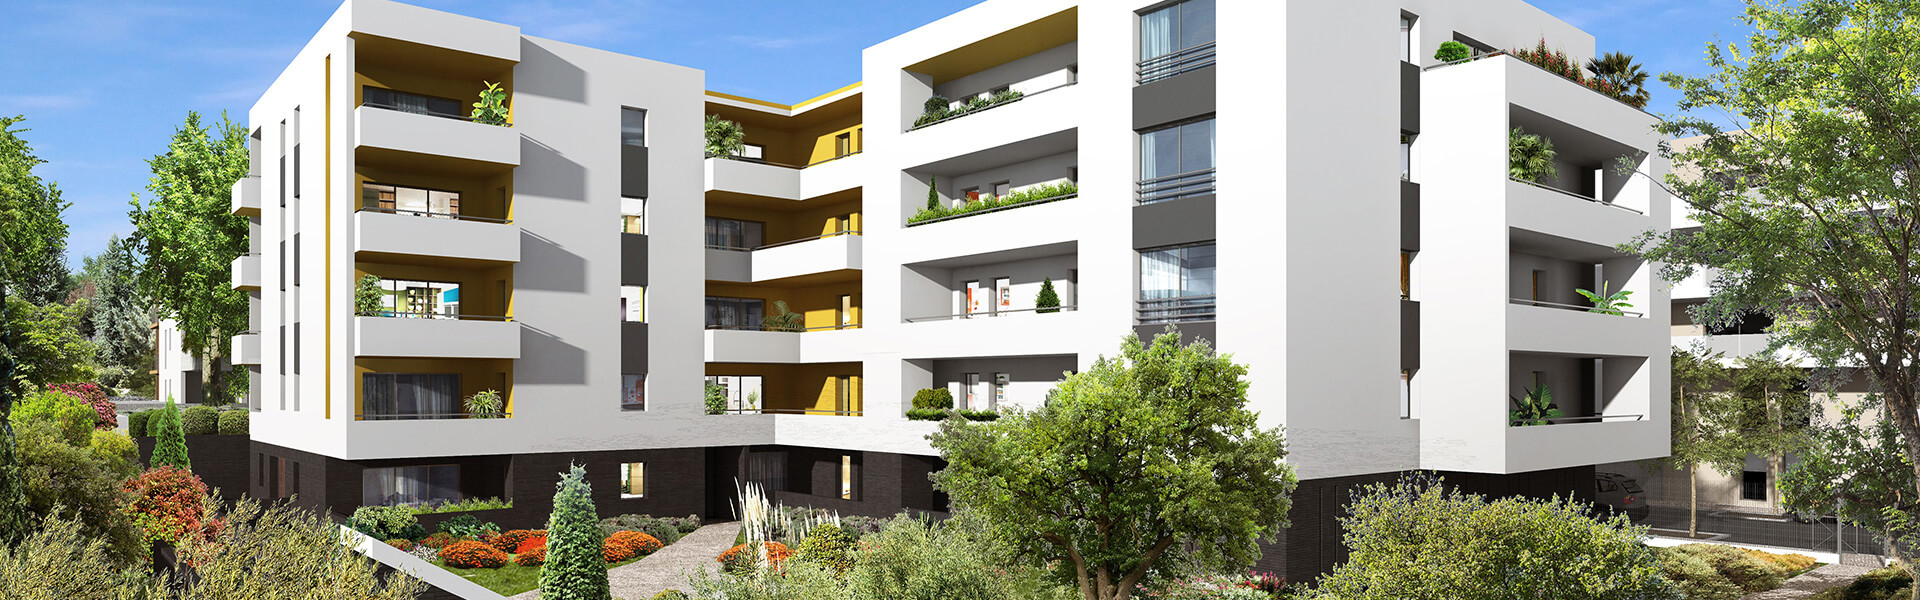 Cote Jardin, domaine belvedere, programme Bacotec